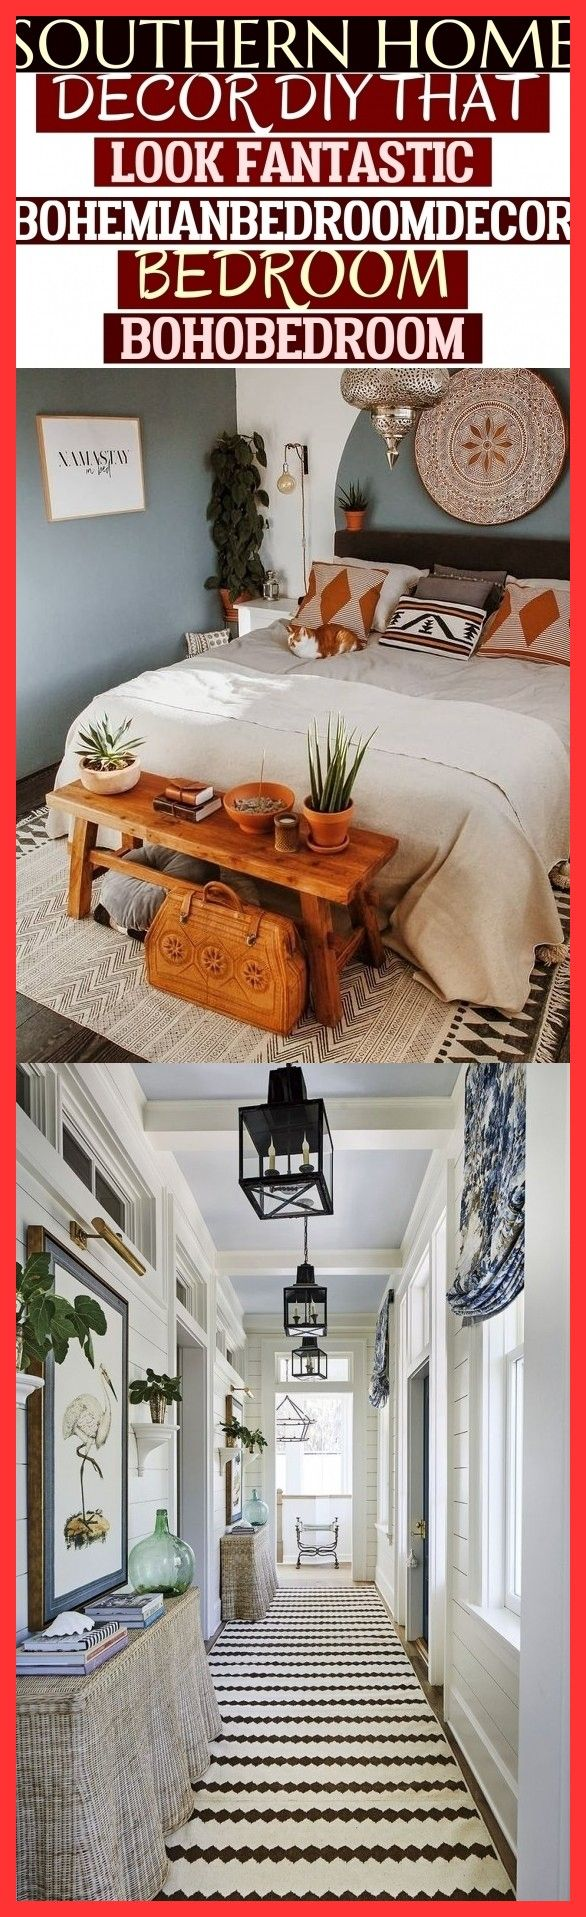 Southern Home Decor Diy That Look Fantastic Bohemianbedroomdecor Bedroom Bohobedroom